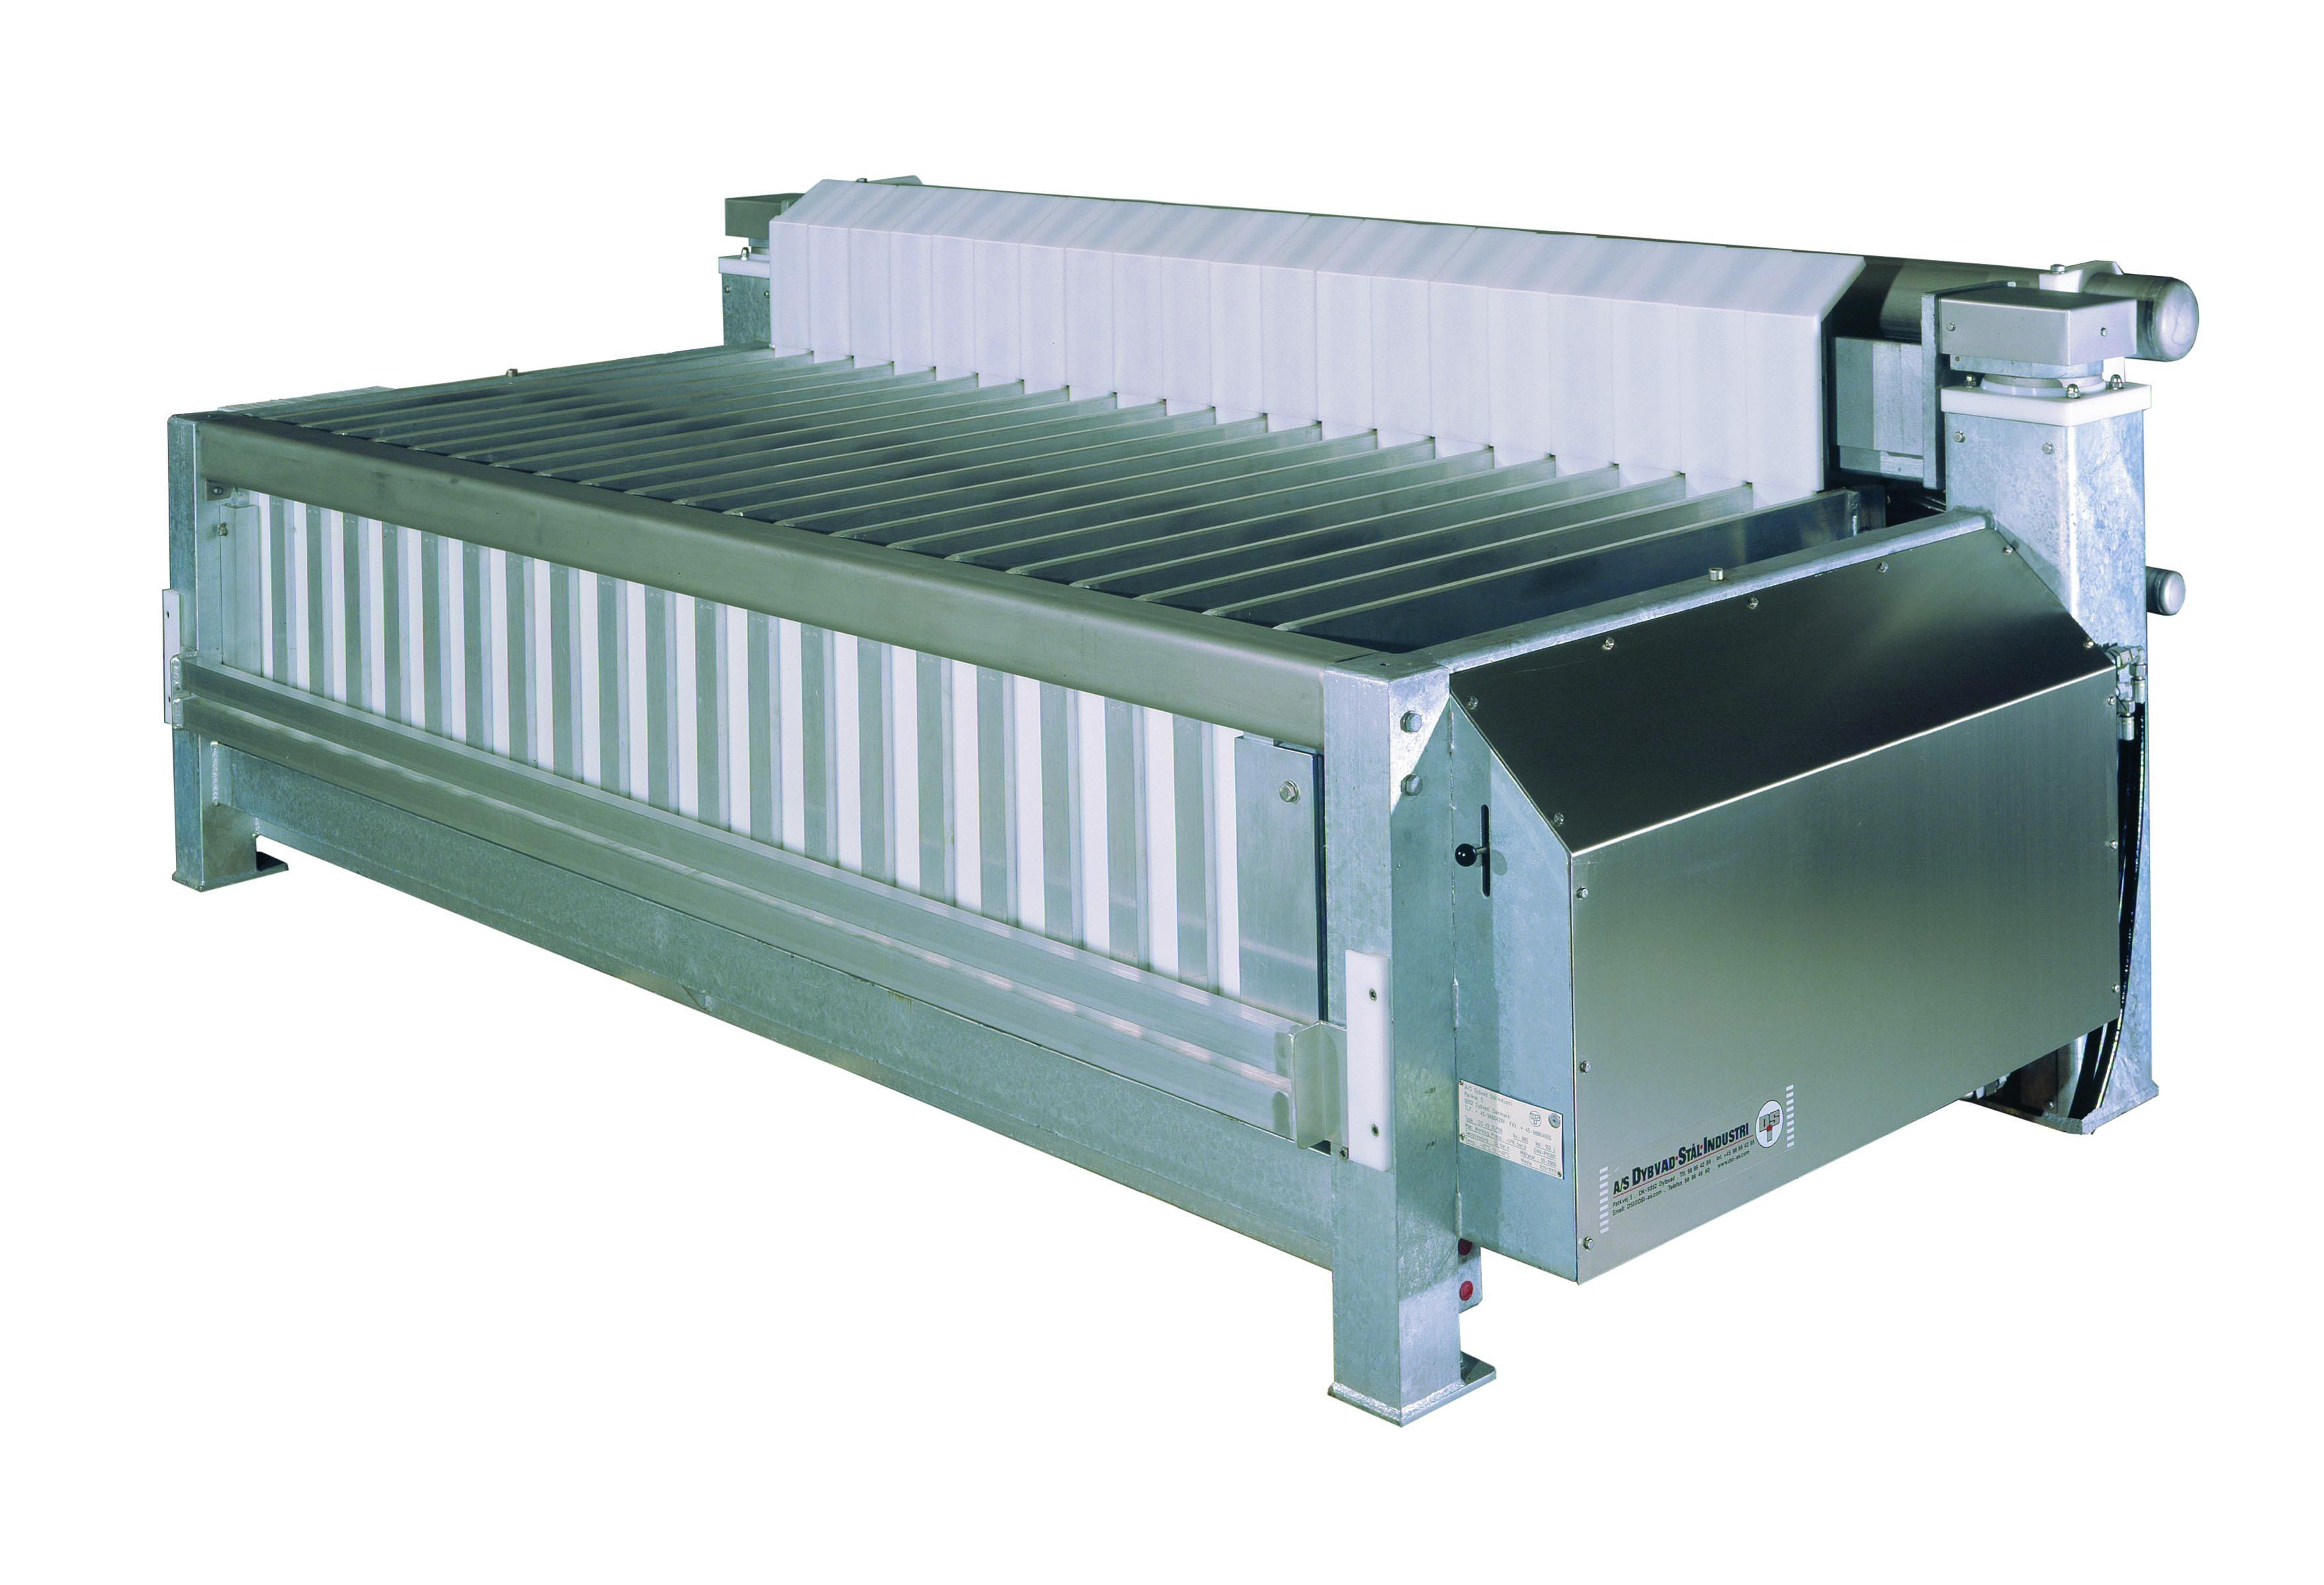 DSI - Vertical plate freezer